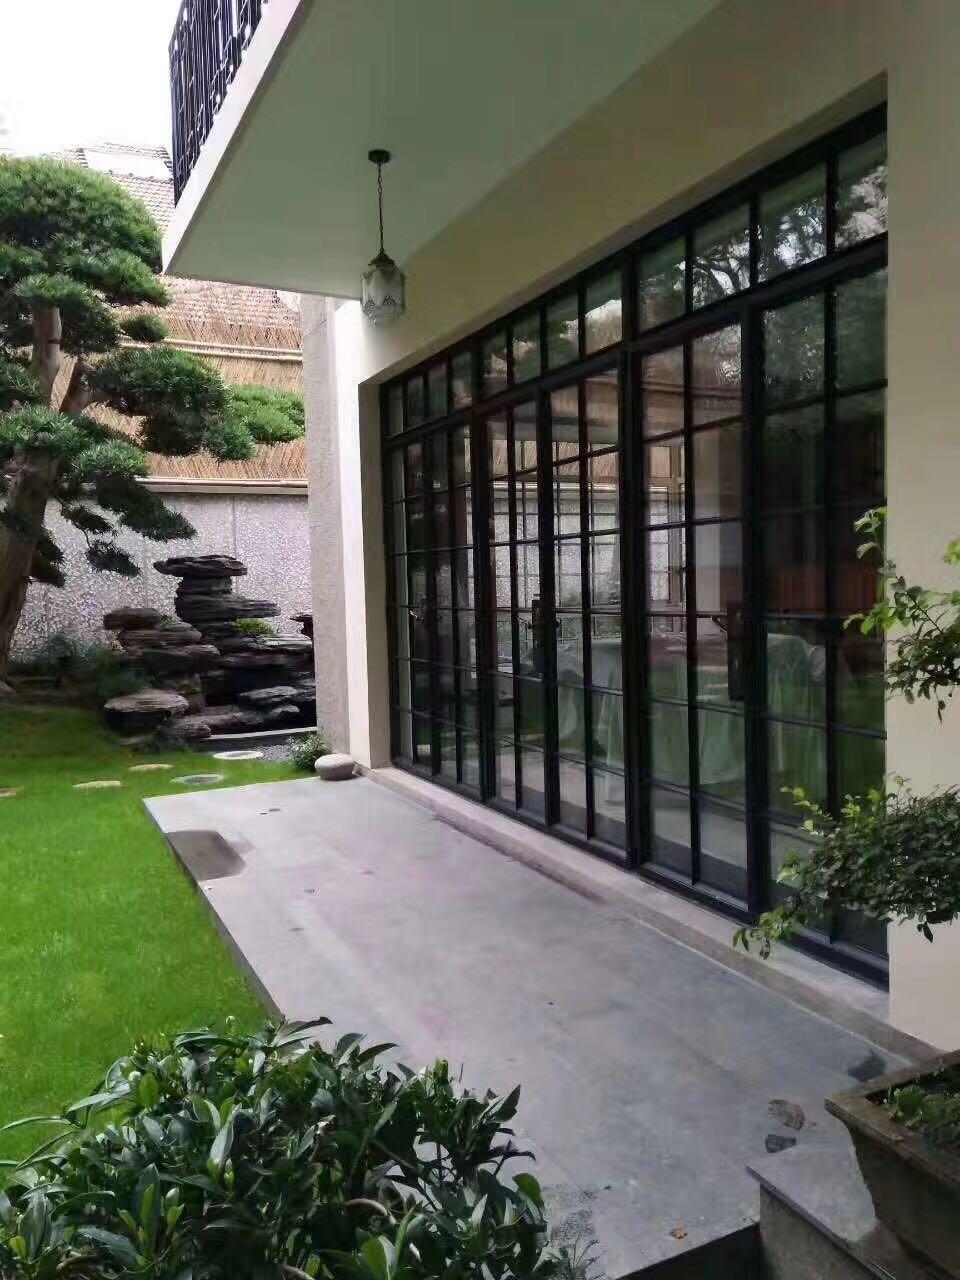 Discount Replacement Windows Stainless Steel Doors And Windows Steel Door Replacement Window Salvaged Steel Windows Window Metal